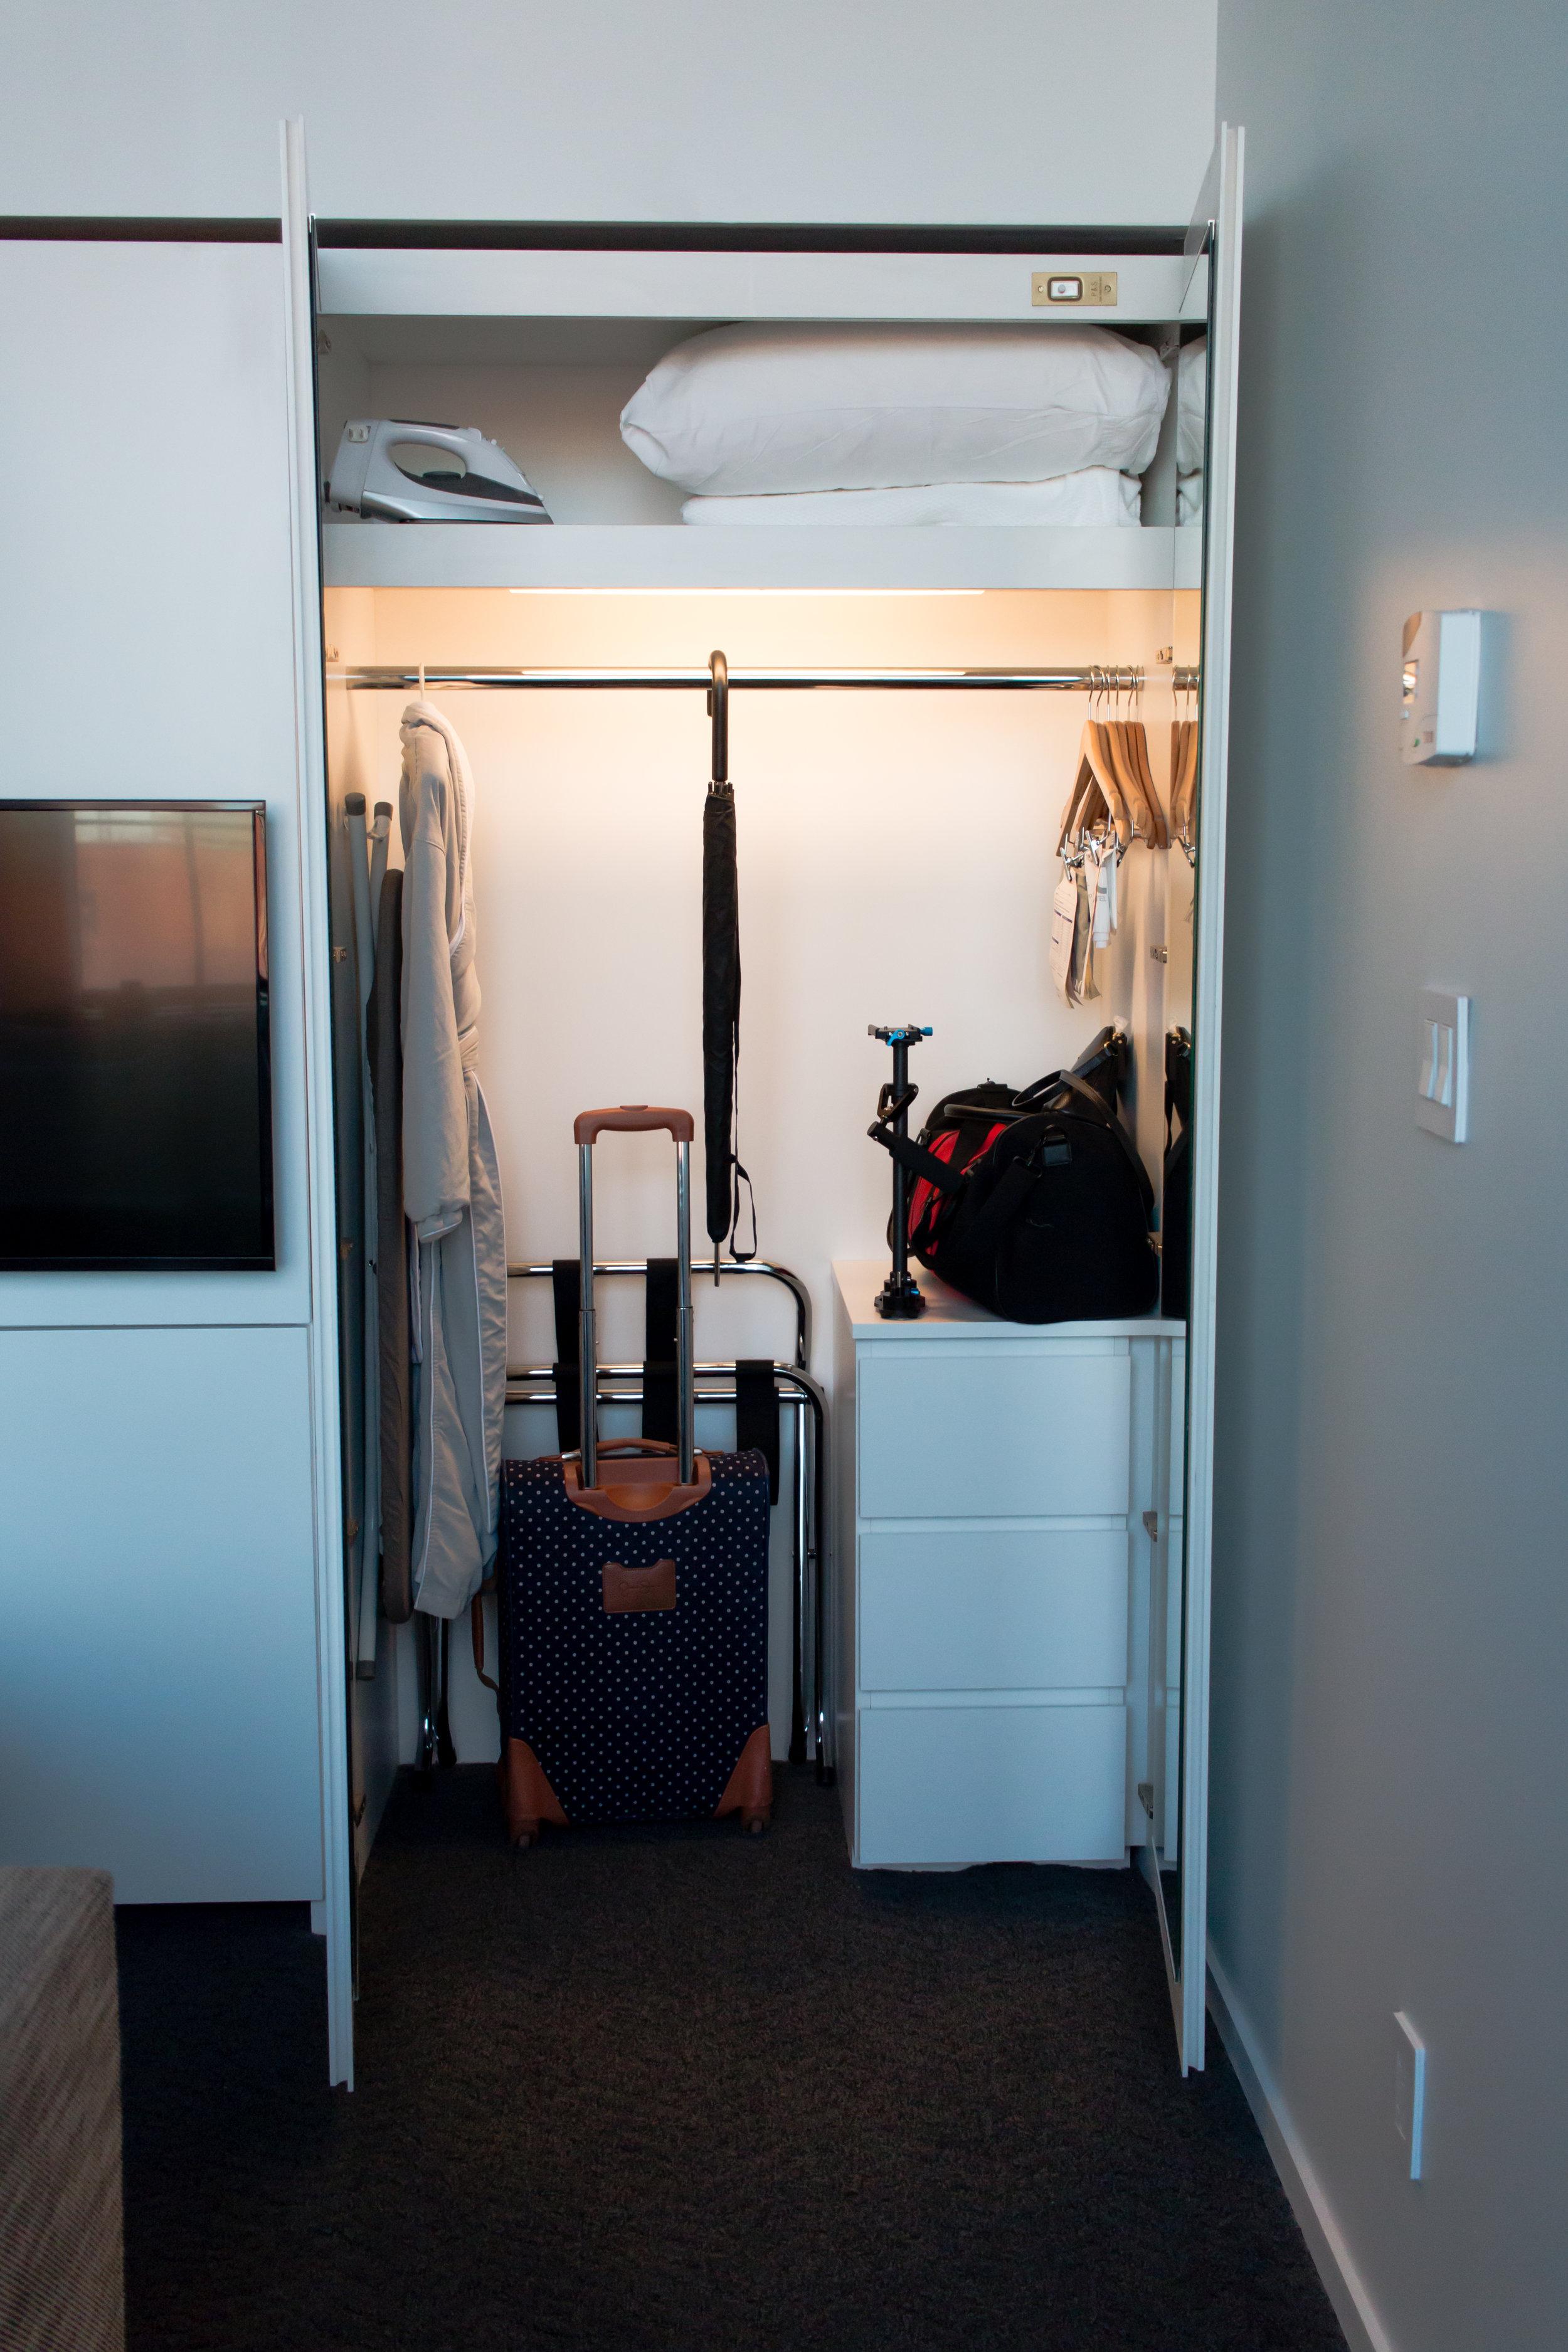 21c-museum-hotel-closet-space-king-room